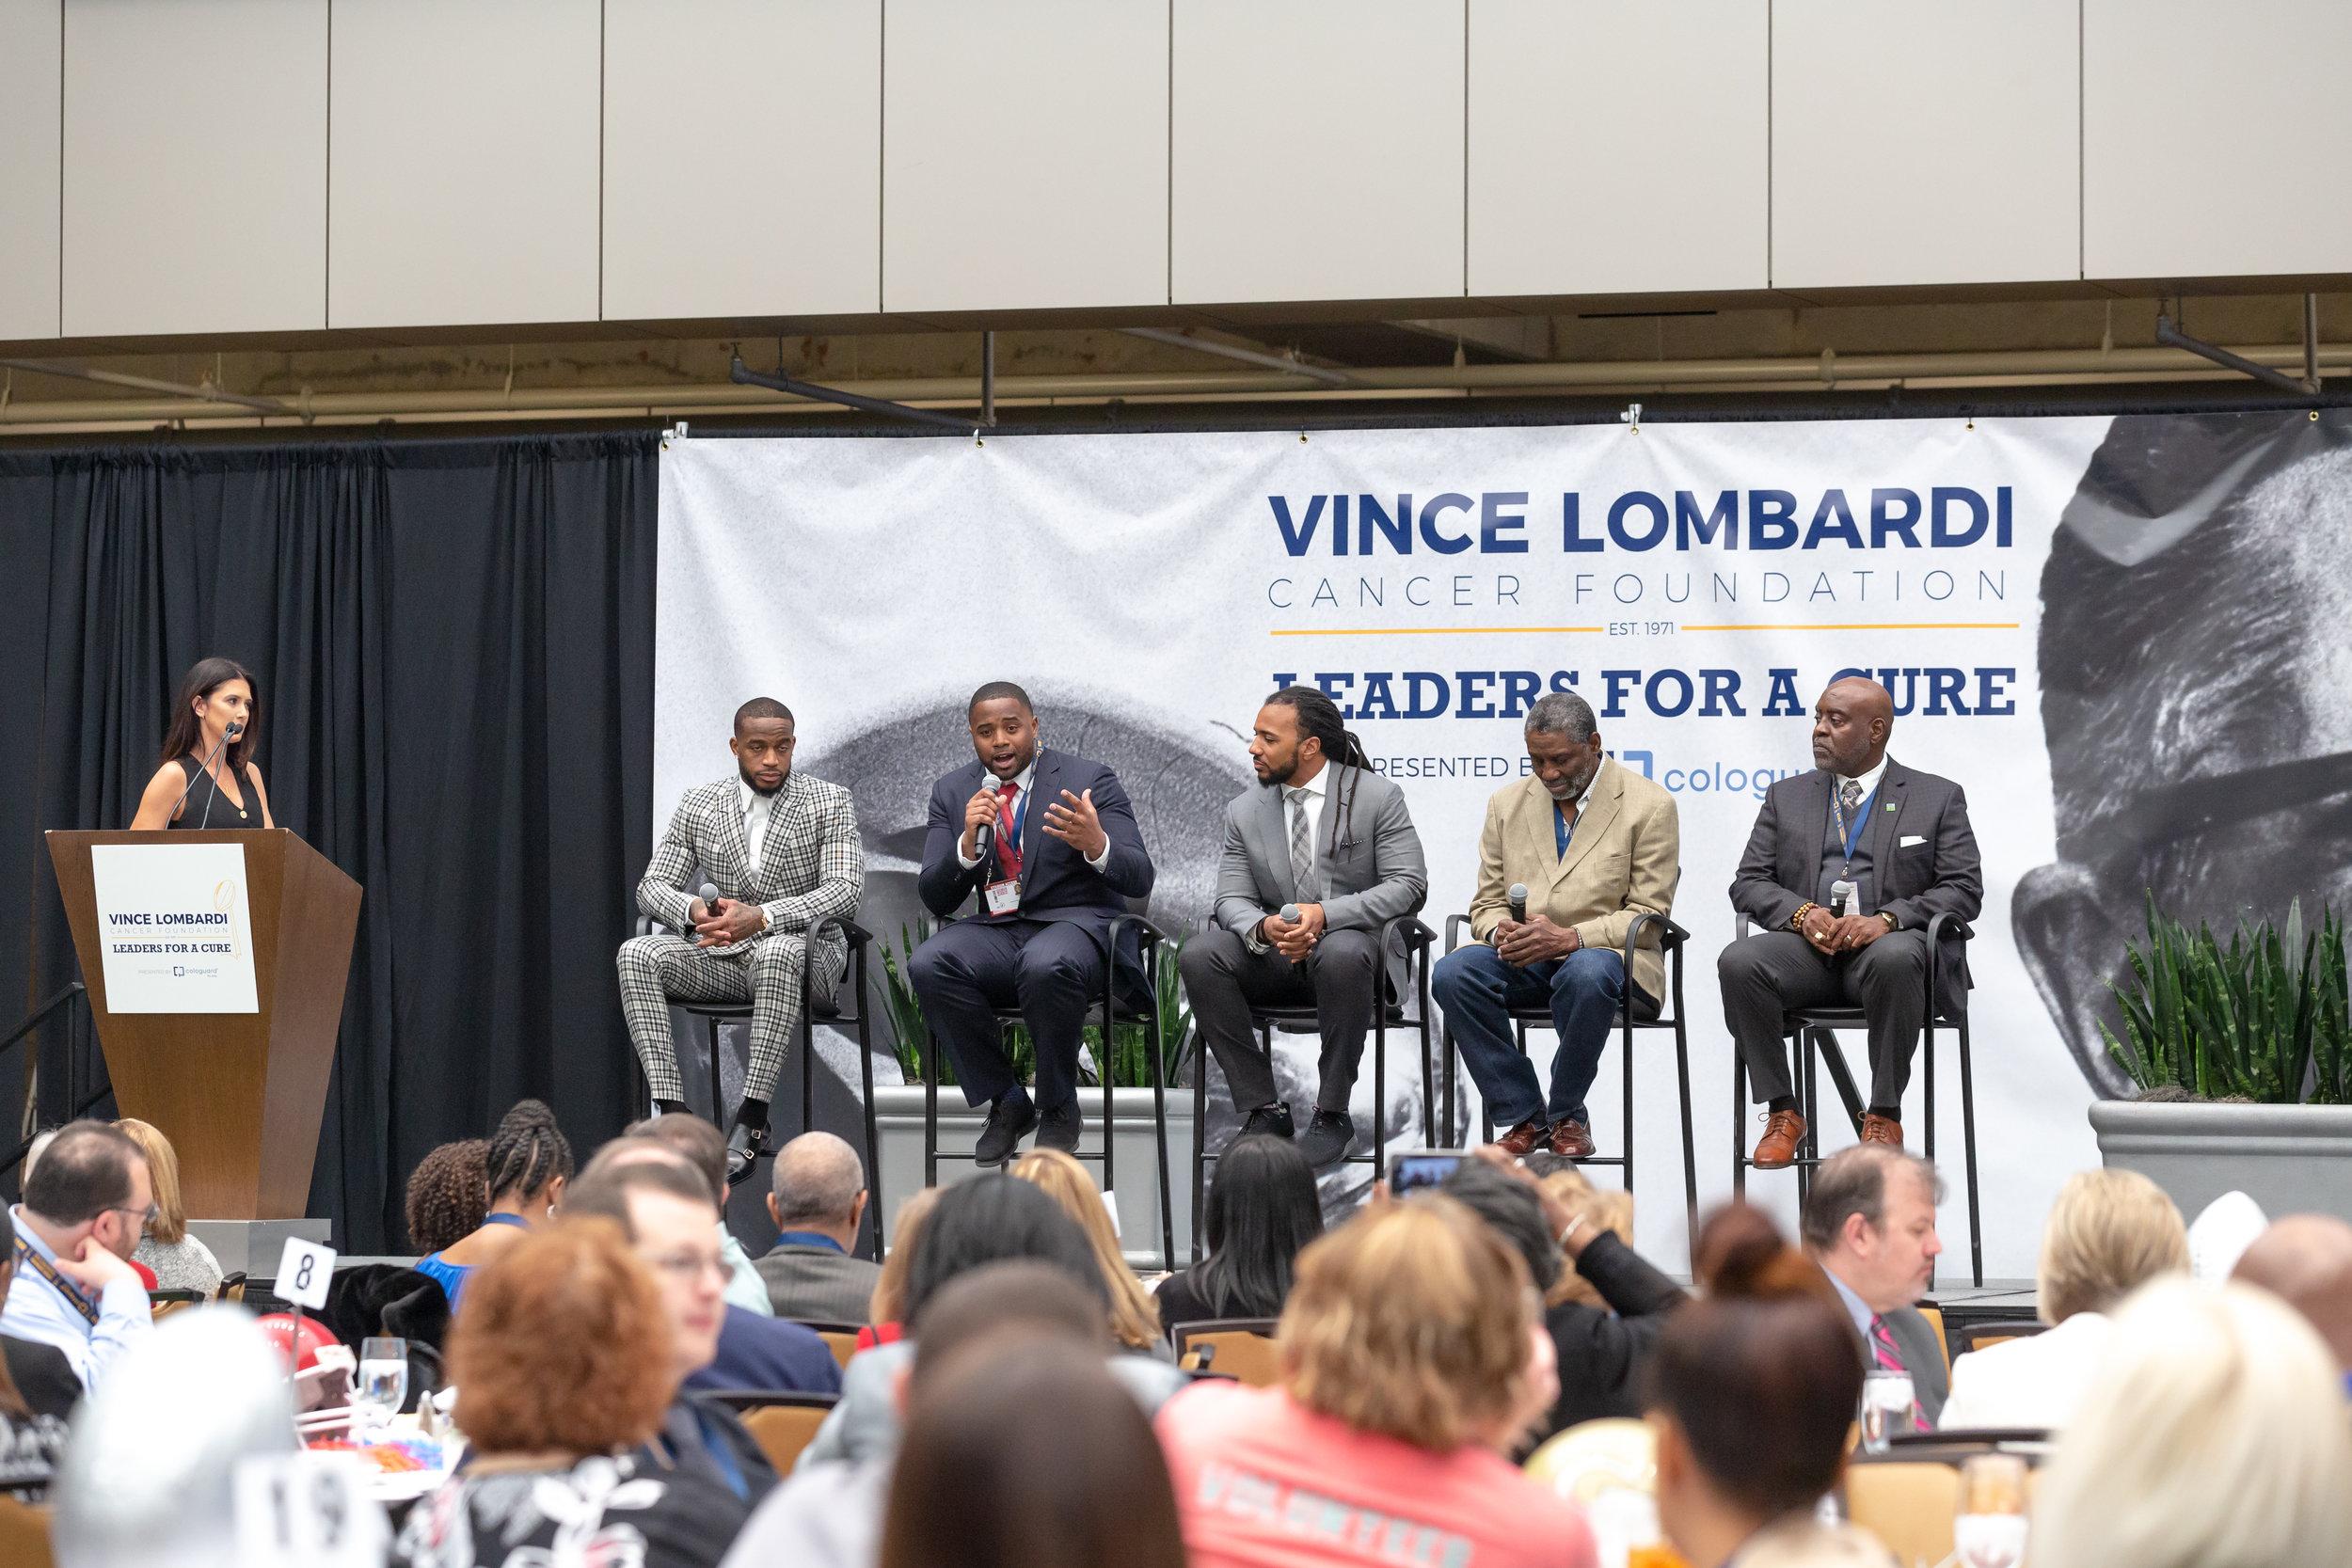 Vince Lombardi Cancer Foundation Event -20190131-0670.jpg